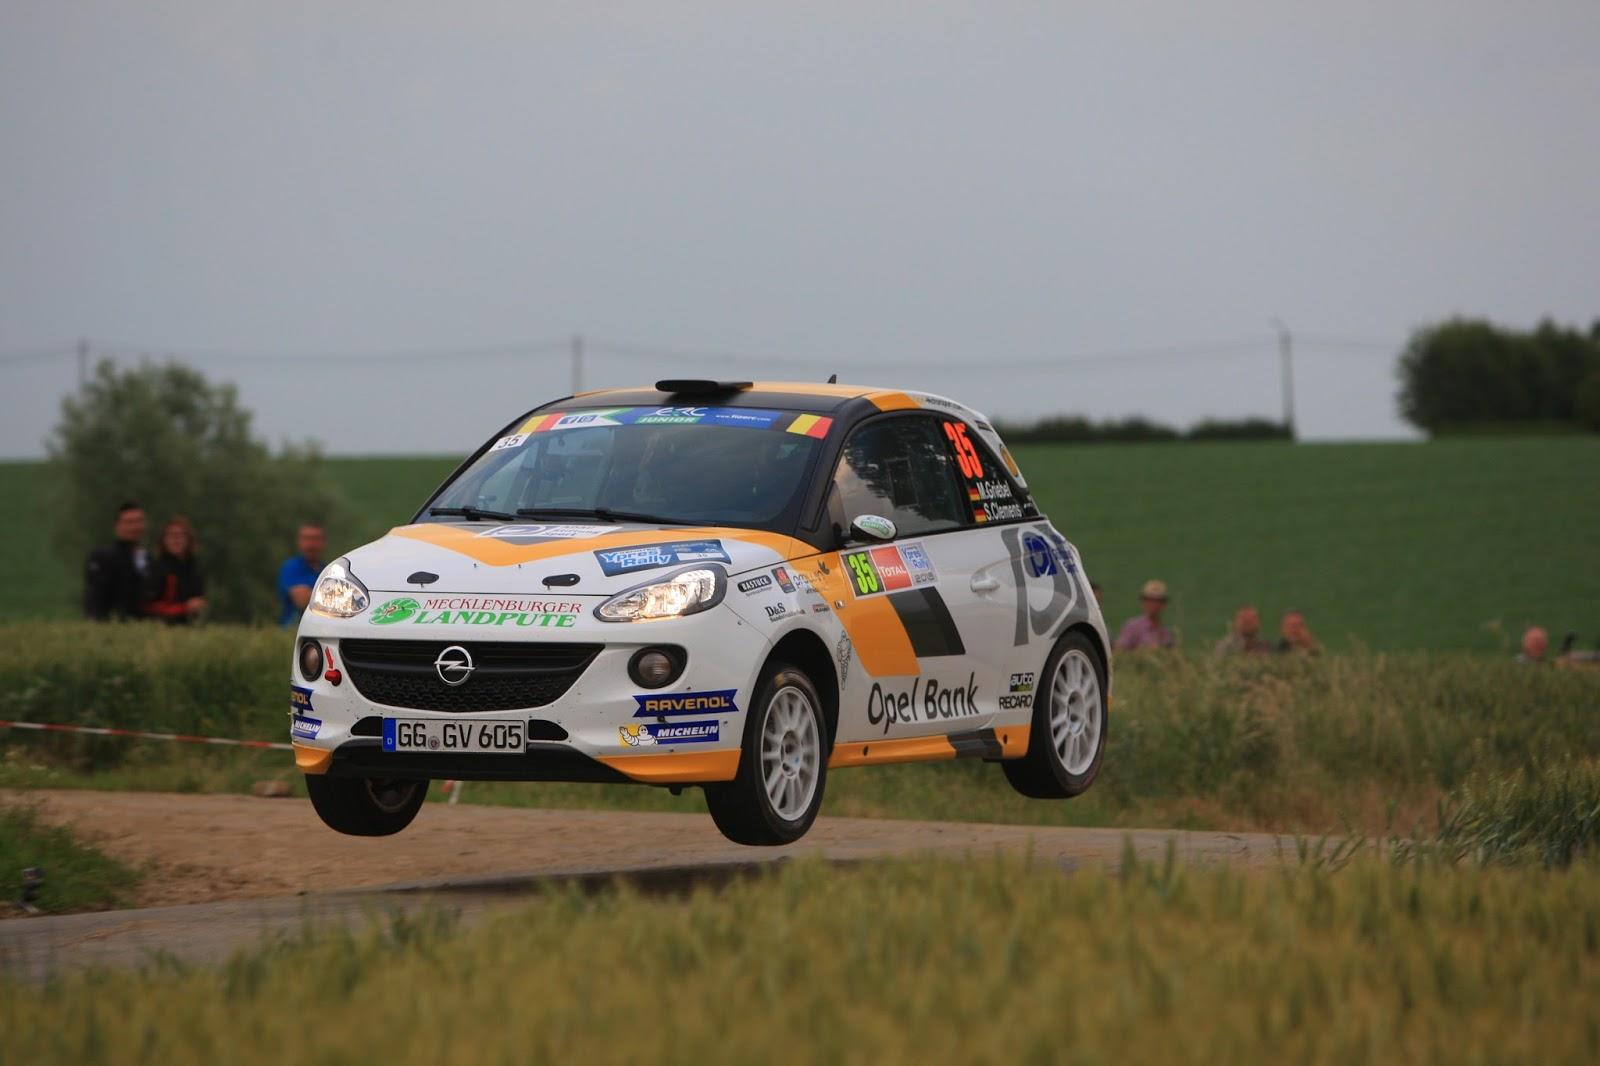 Opel ADAM R2 Junior Rallye 297372 Το Opel ADAM Θα υπερασπιστεί τον τίτλο του πρωταθλήματος ERC Junior ERC Junior FIA, FIA, Opel ADAM, Opel ADAM R2, Rally, videos